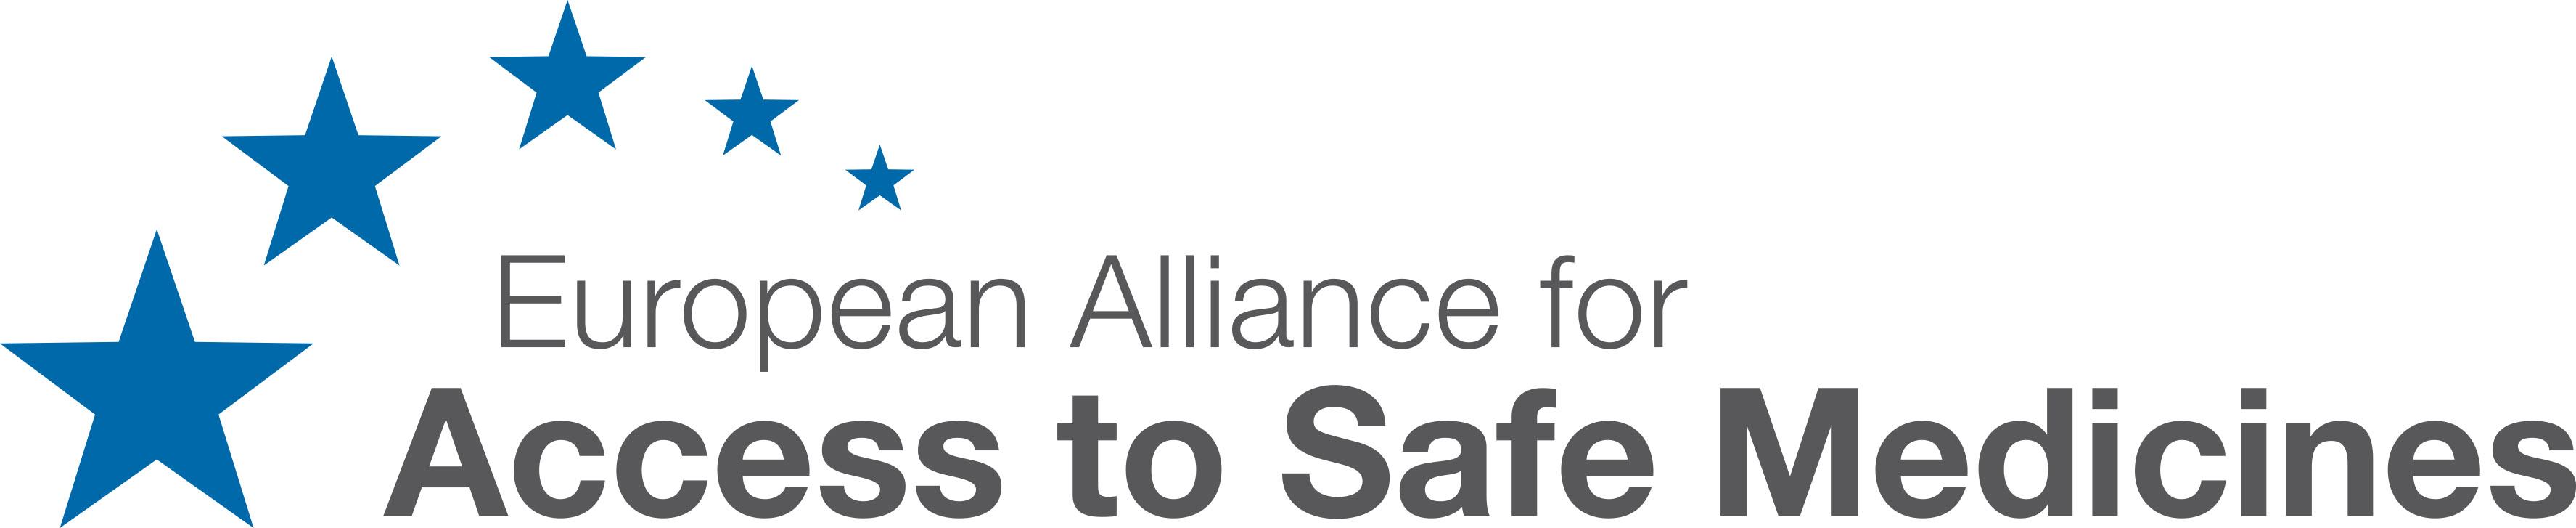 European Alliance for Access to Safe Medicines (EAASM)